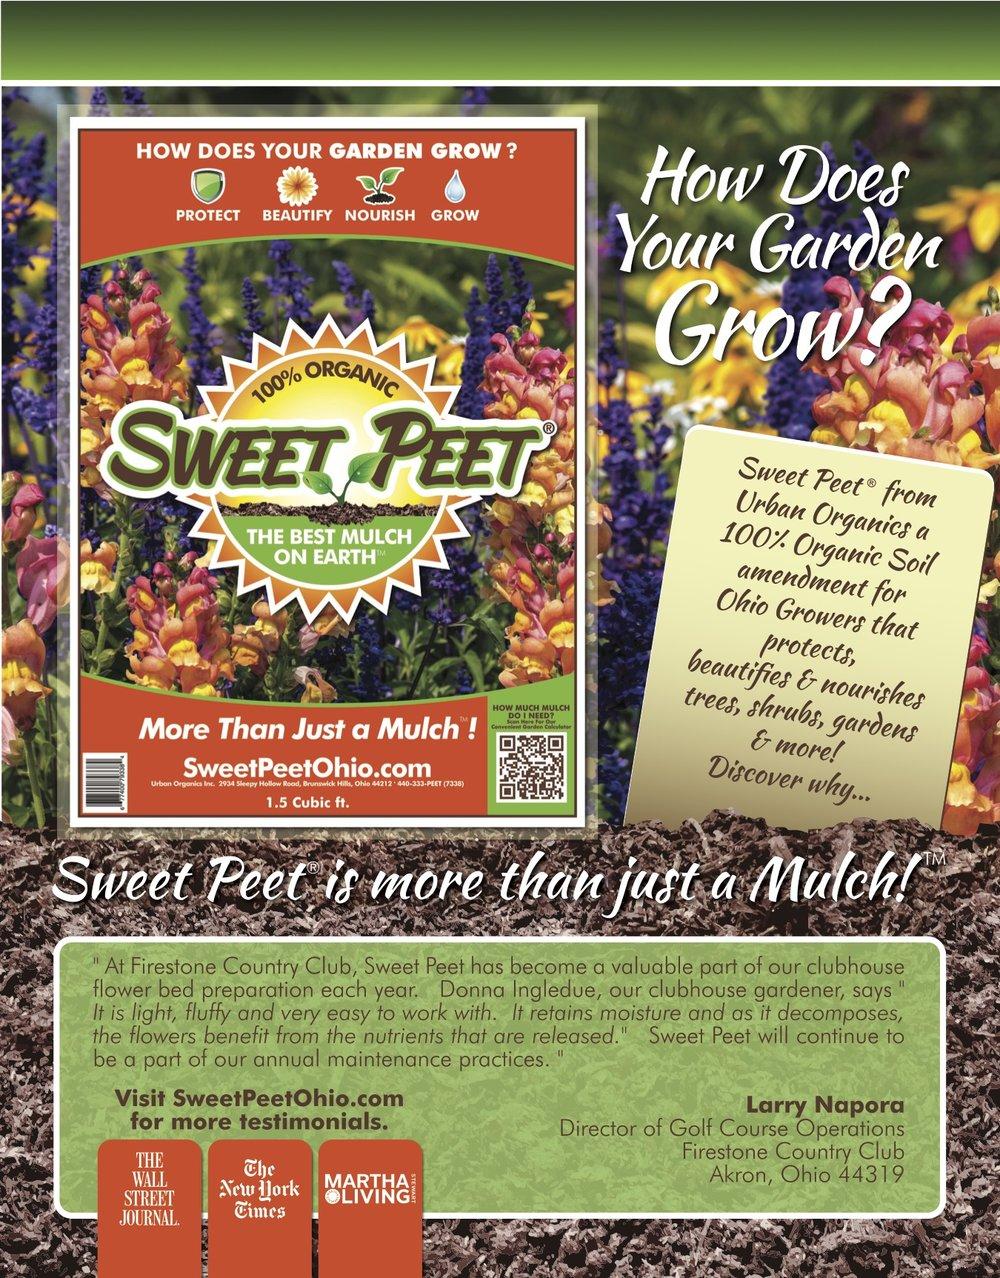 SweetPeet_SalesSheet_BagInfo_8.5x11_FINAL 021916.jpg